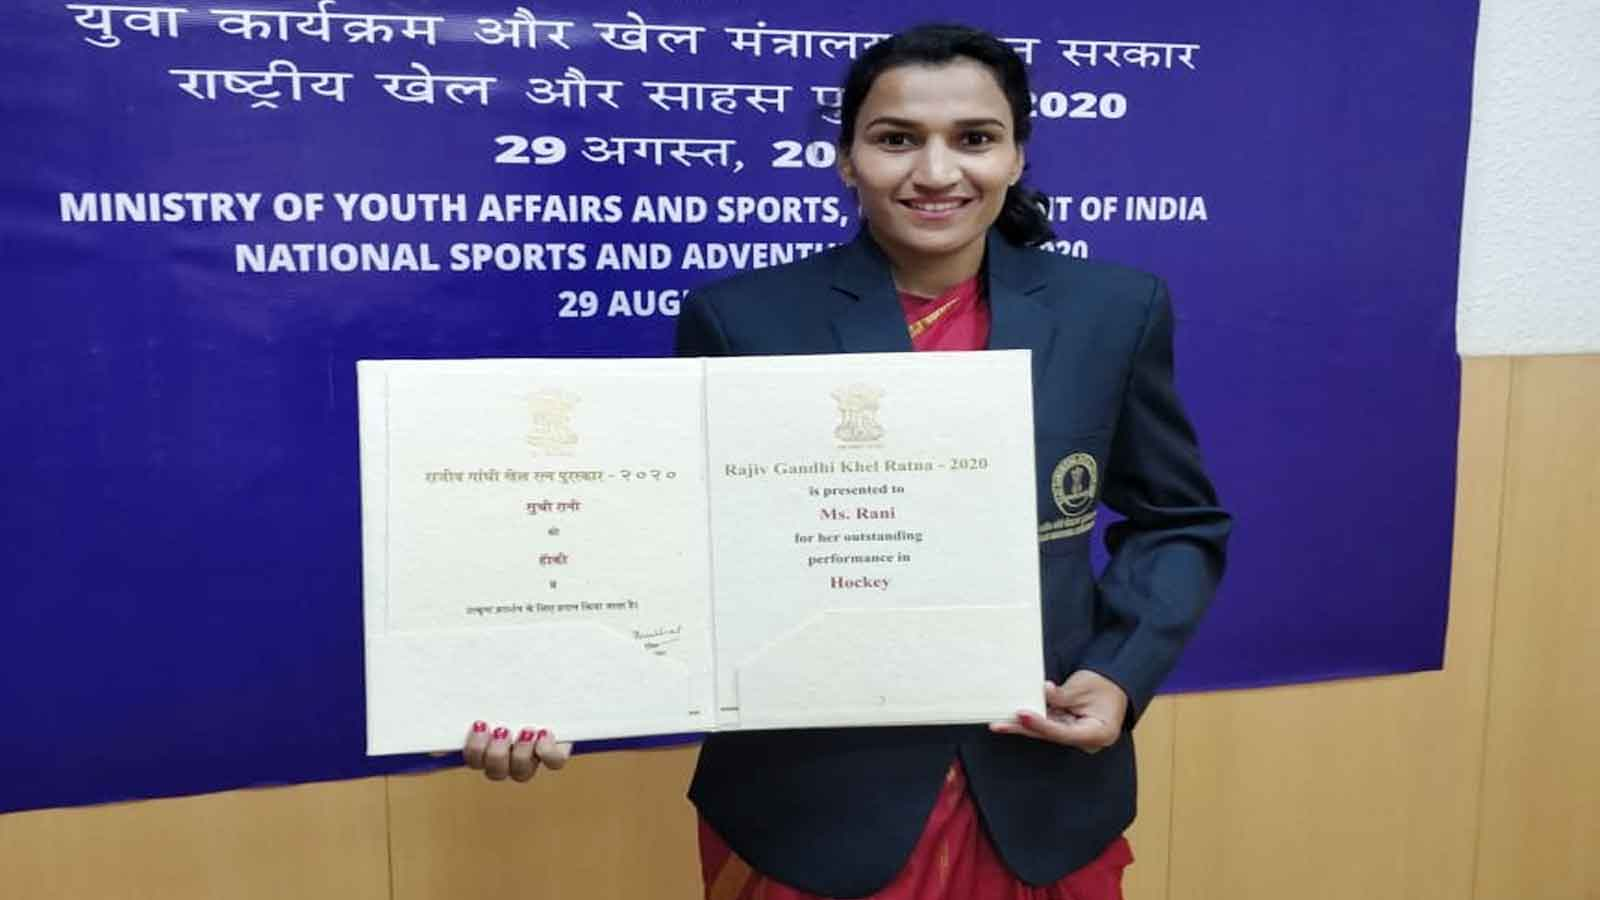 president-ram-nath-kovind-confers-national-sports-and-adventure-awards-2020-virtually